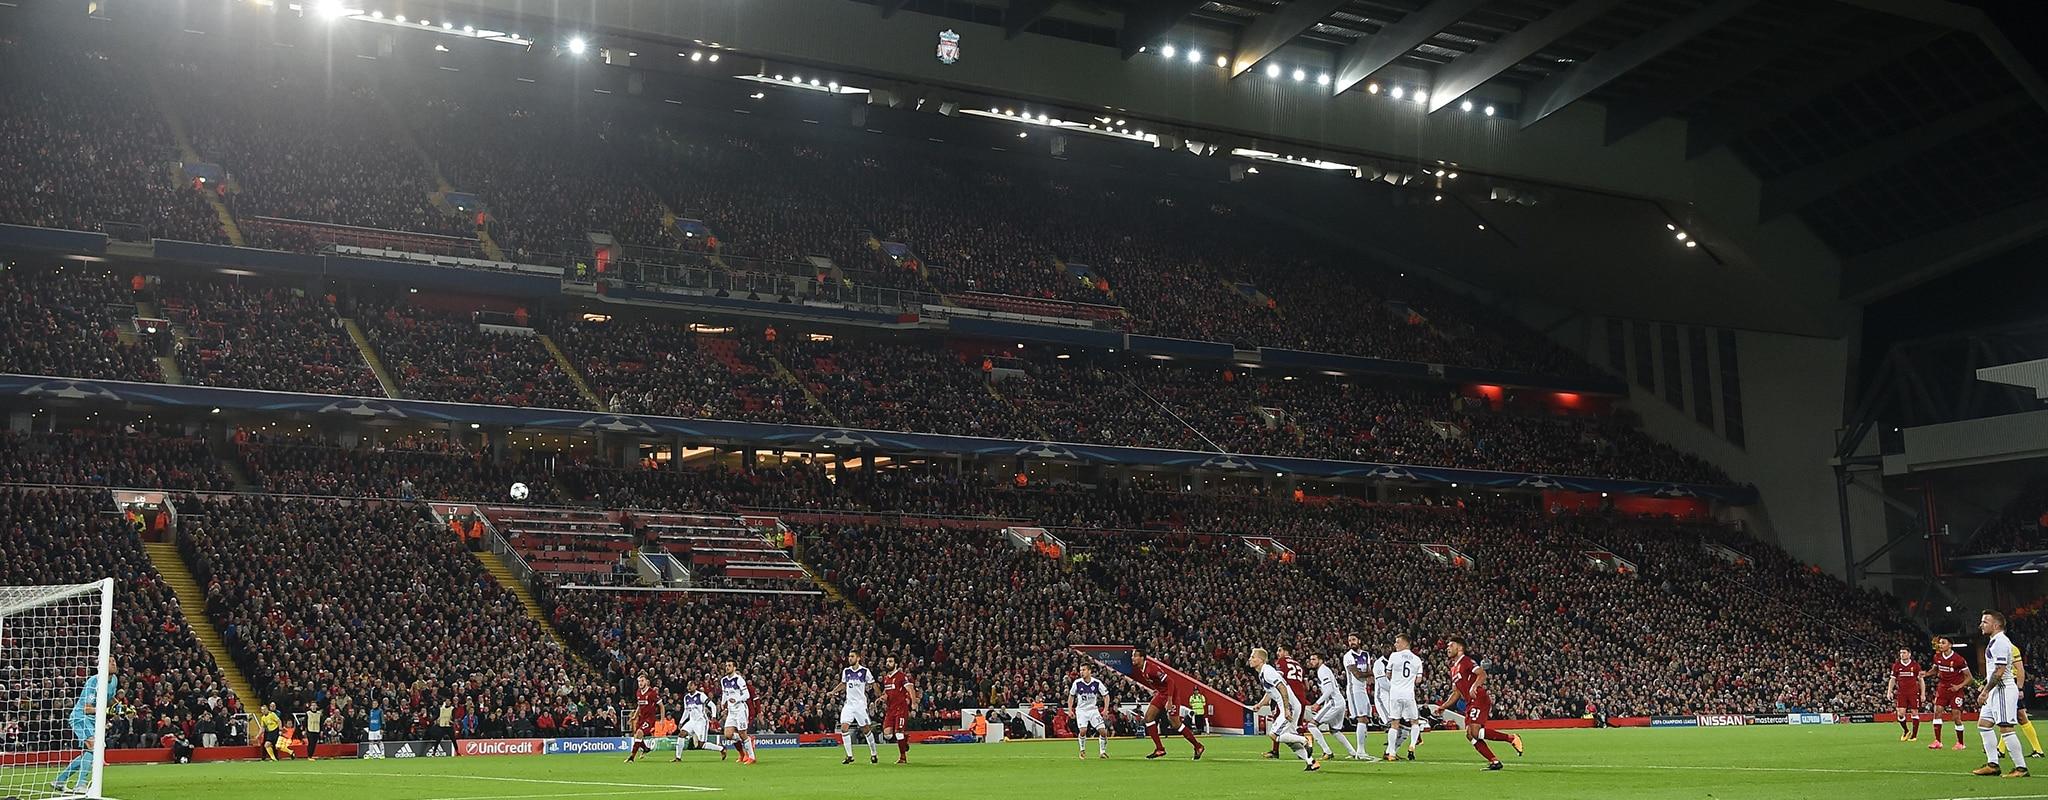 Liverpool-Atalanta | Liverpool vs Atalanta: UEFA Champions ...